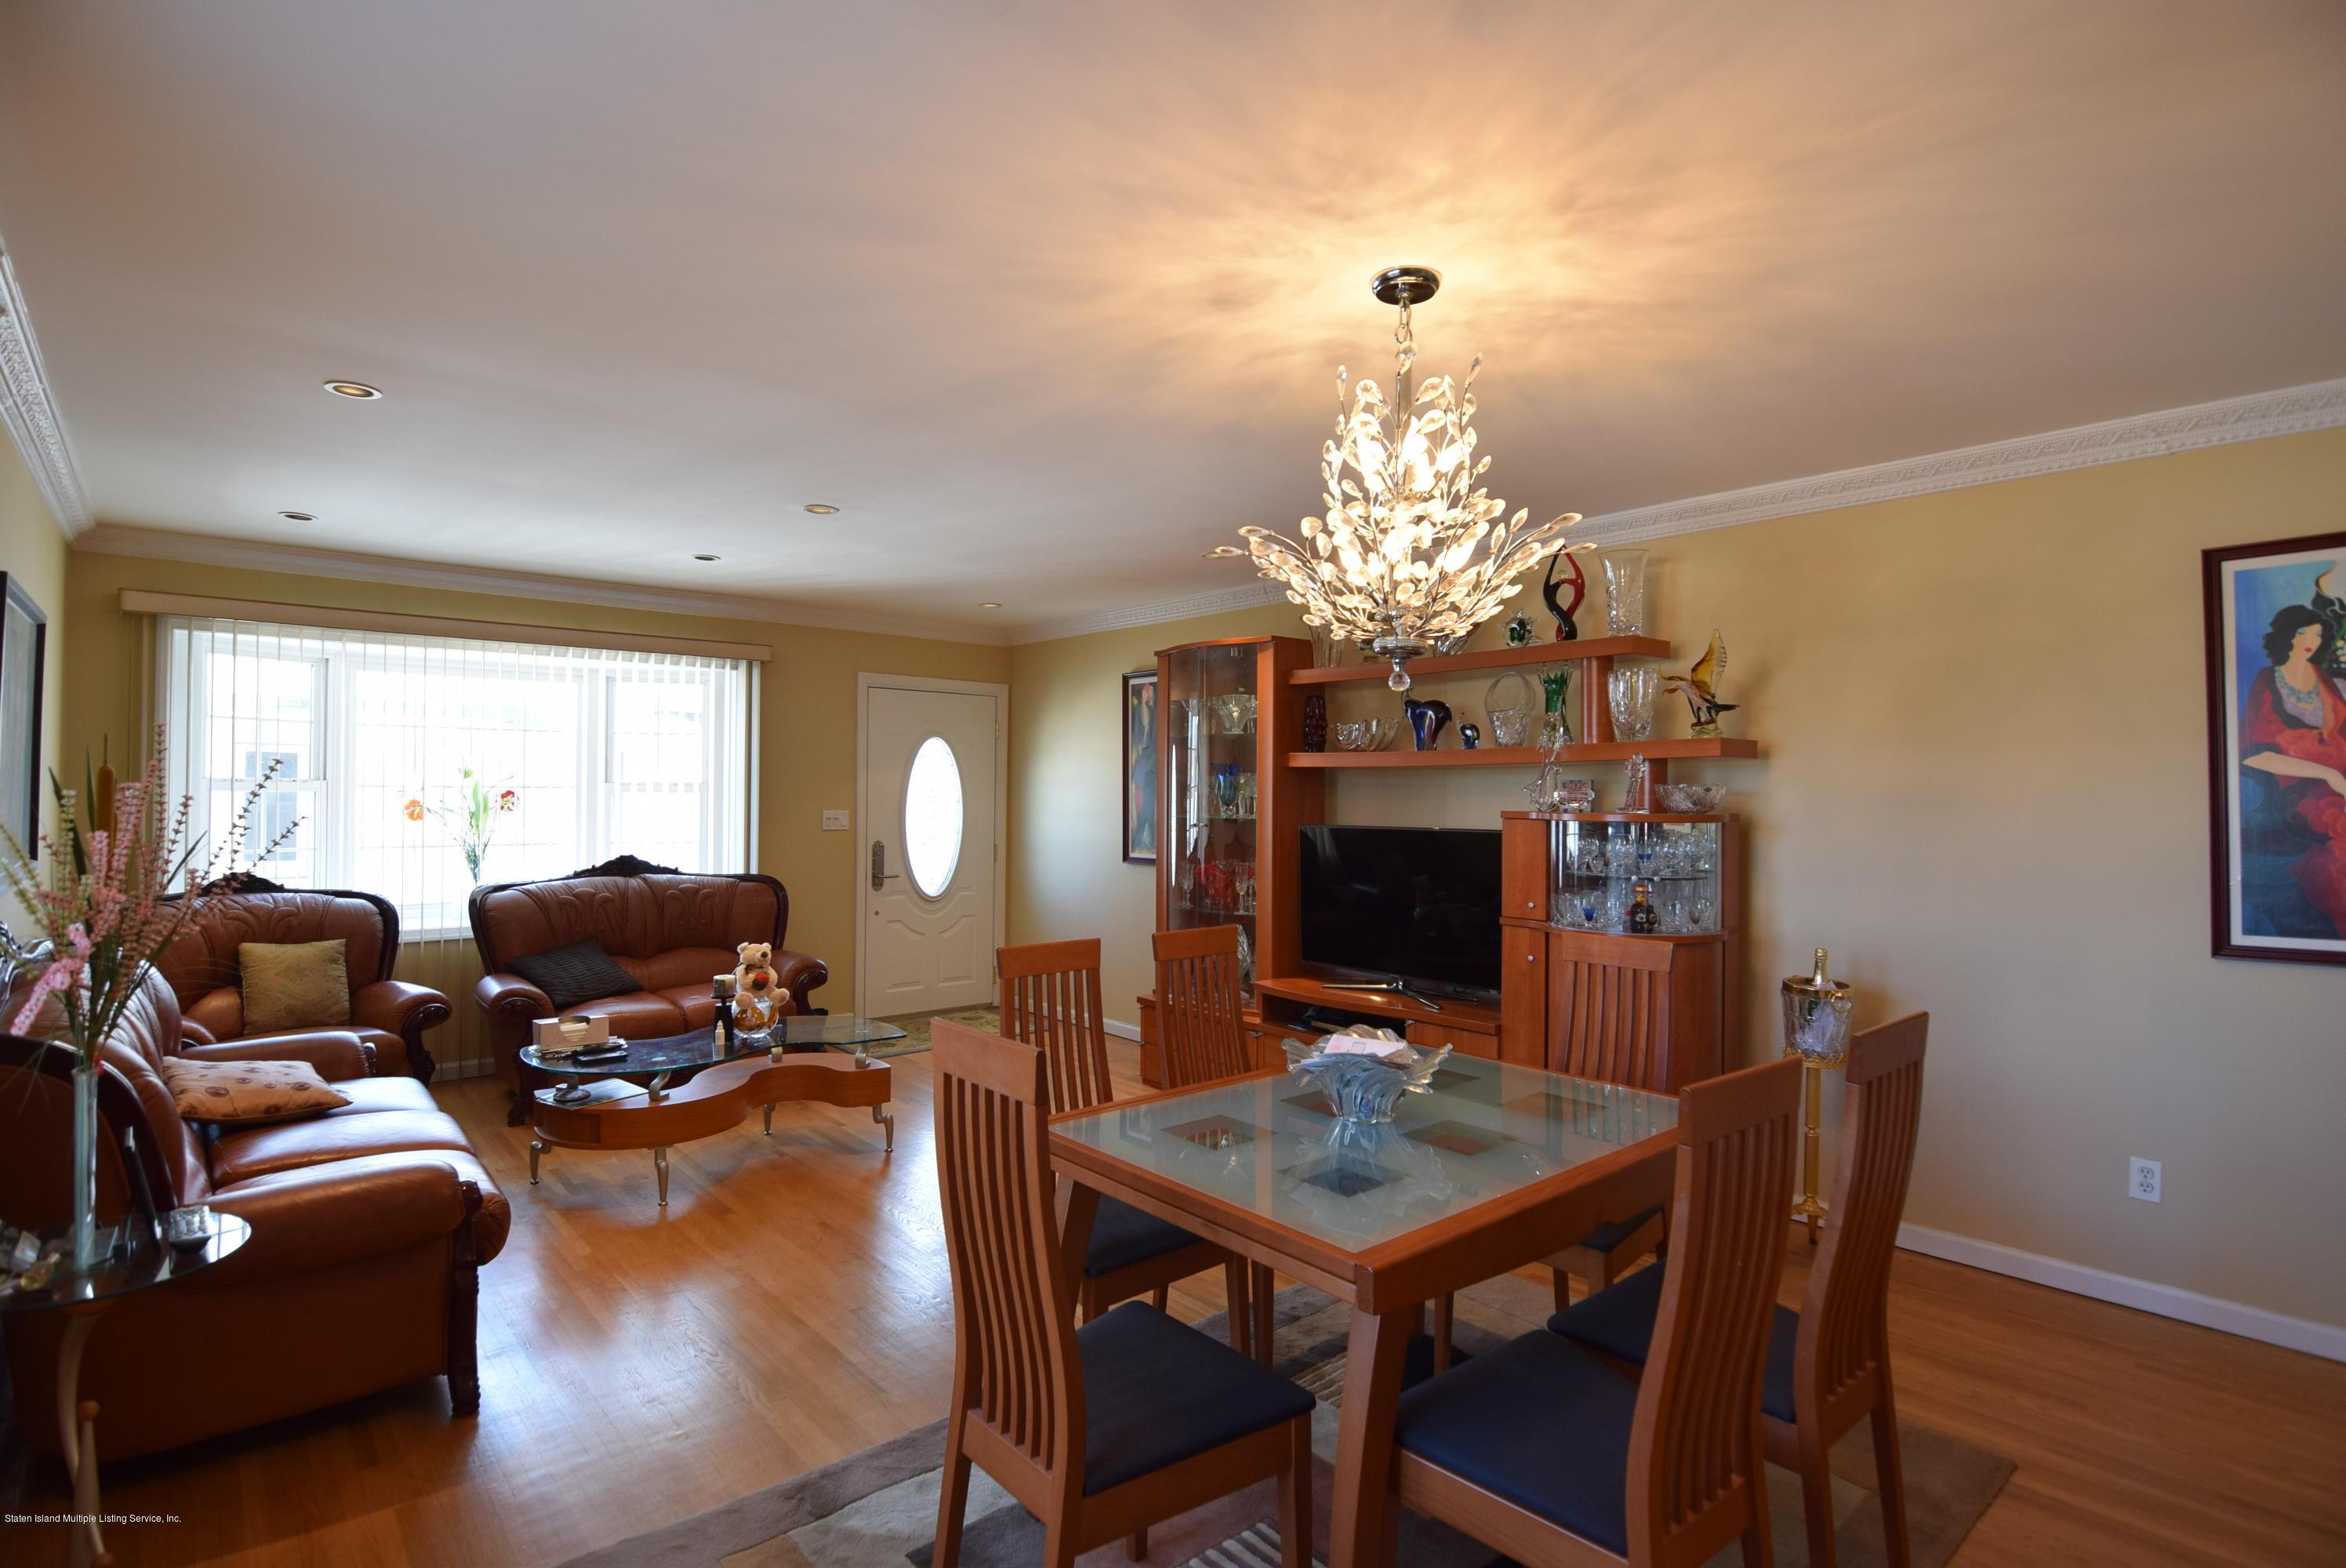 Single Family - Semi-Attached 15 Erwin Court  Staten Island, NY 10306, MLS-1126740-4